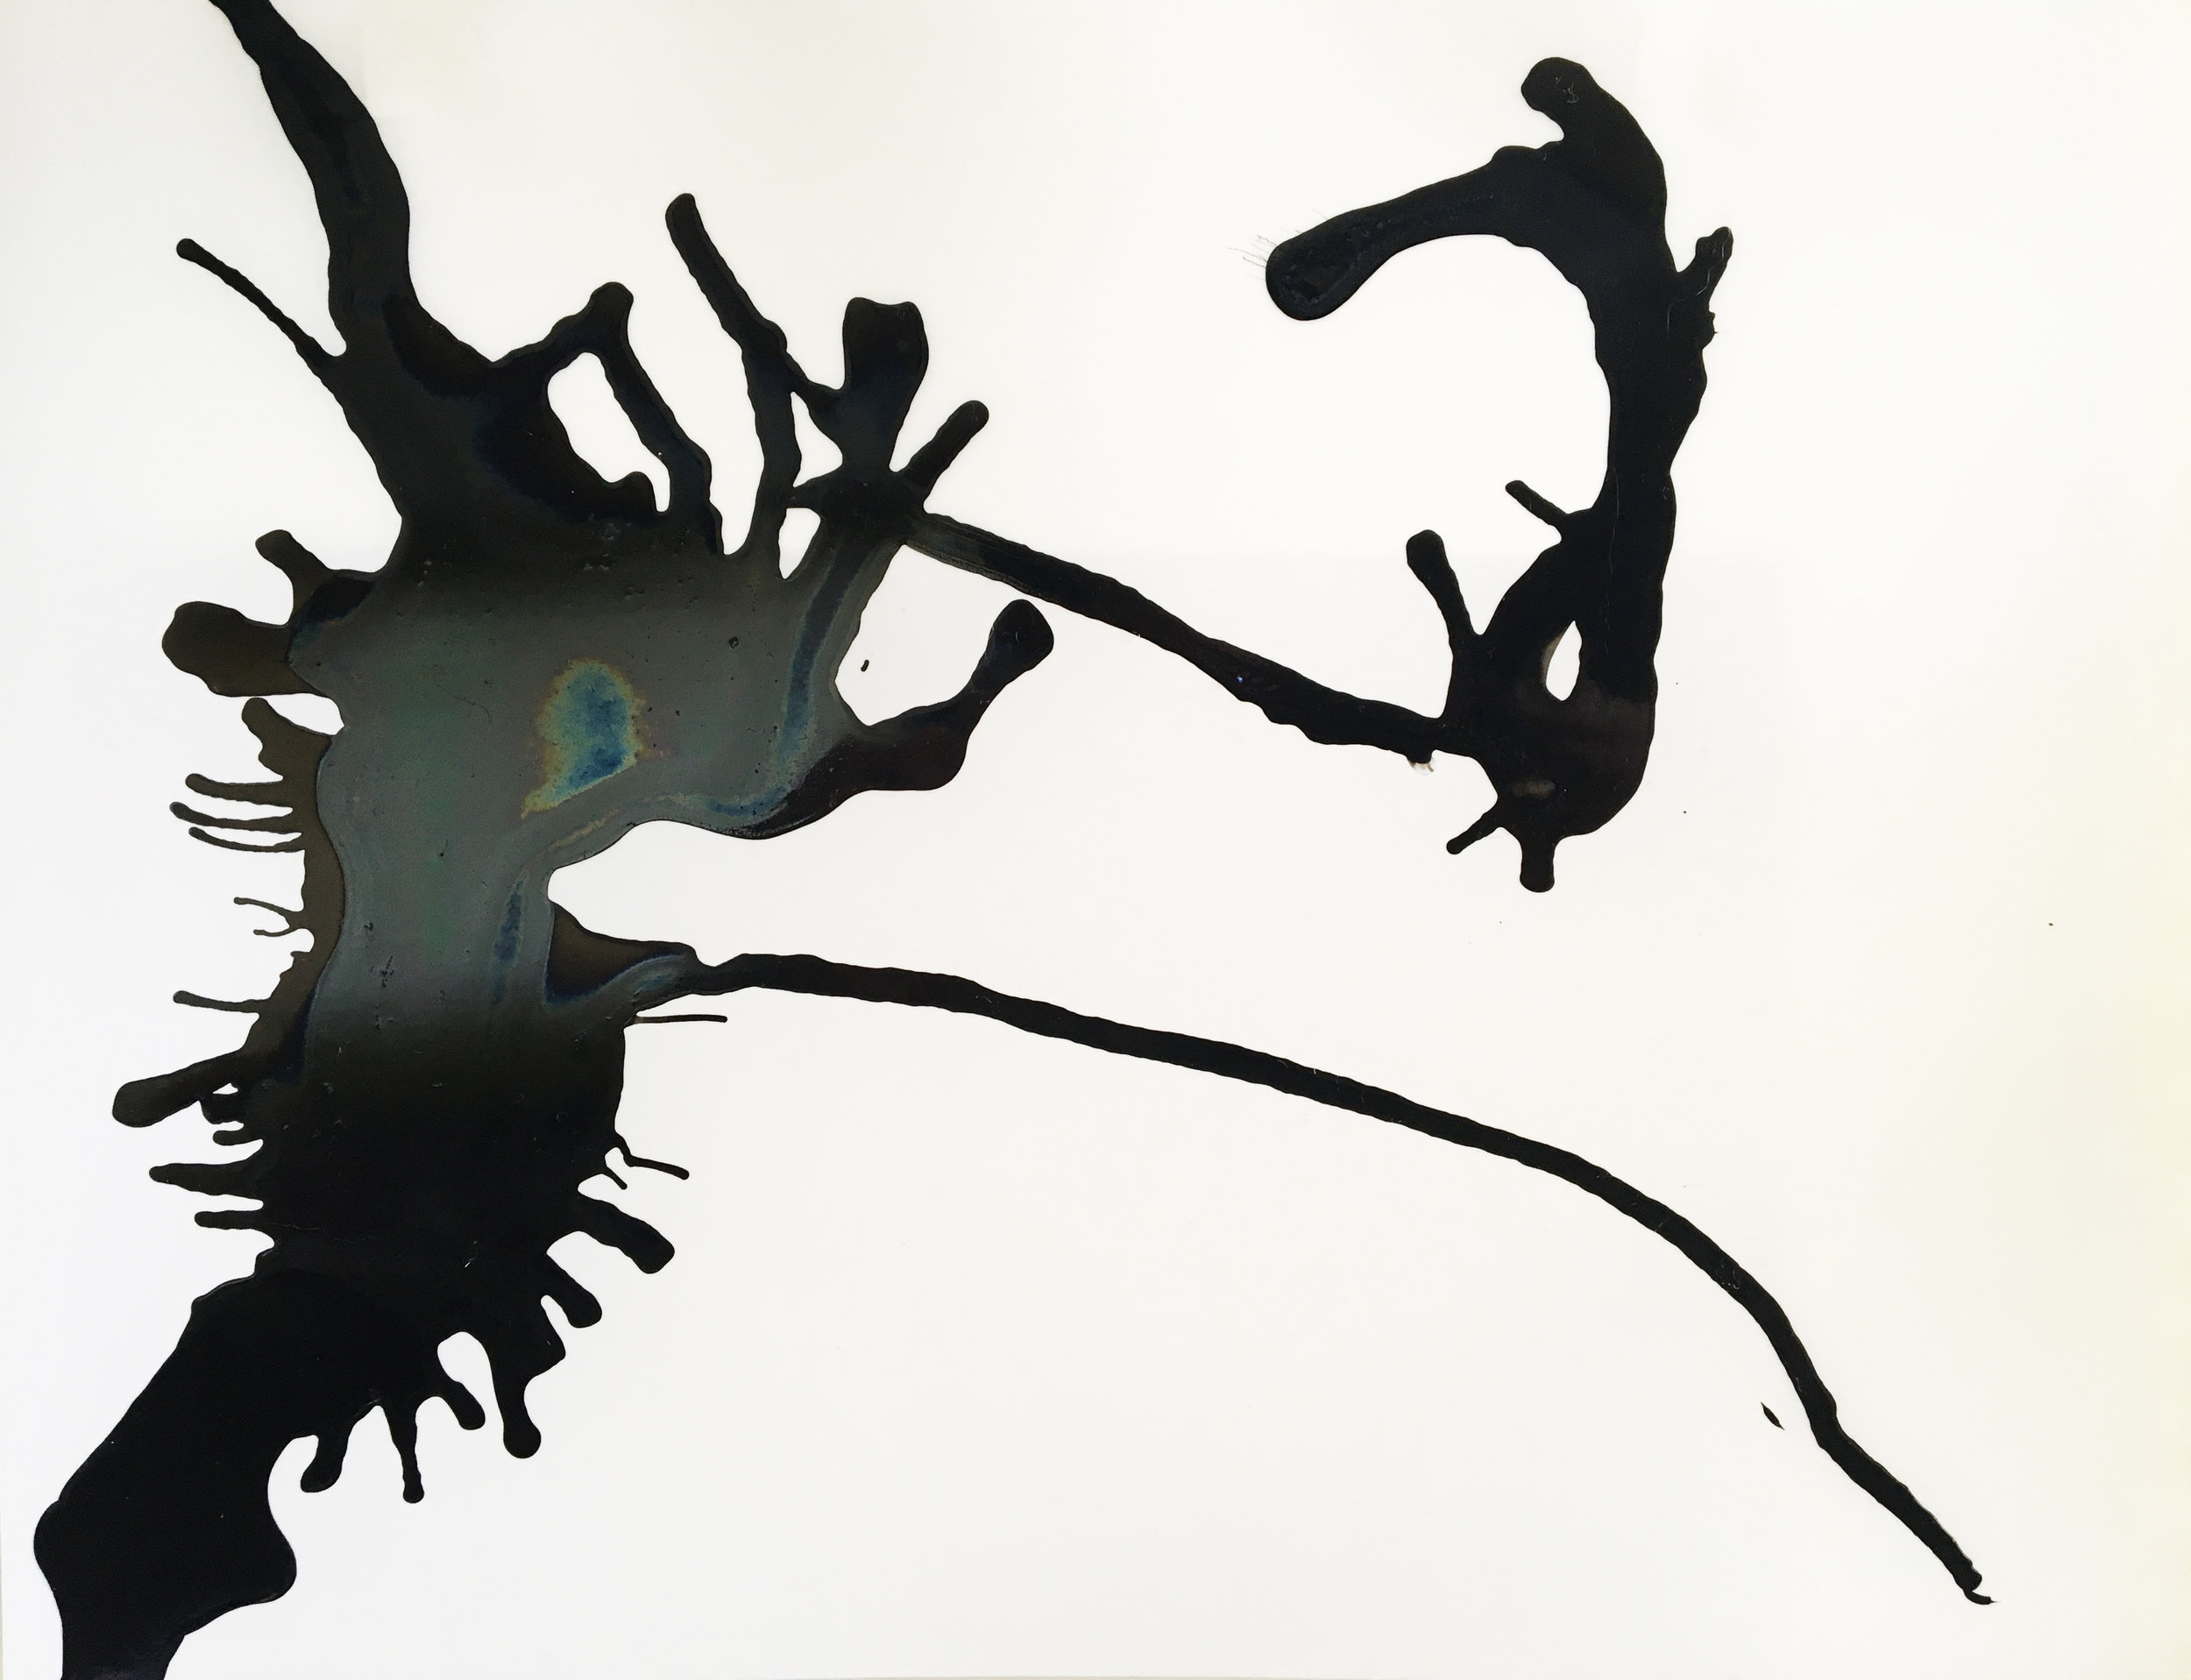 "Amoco Cadiz '78, 2017  11"" x 17"", Ink on Vellum  ©kellycorrell"